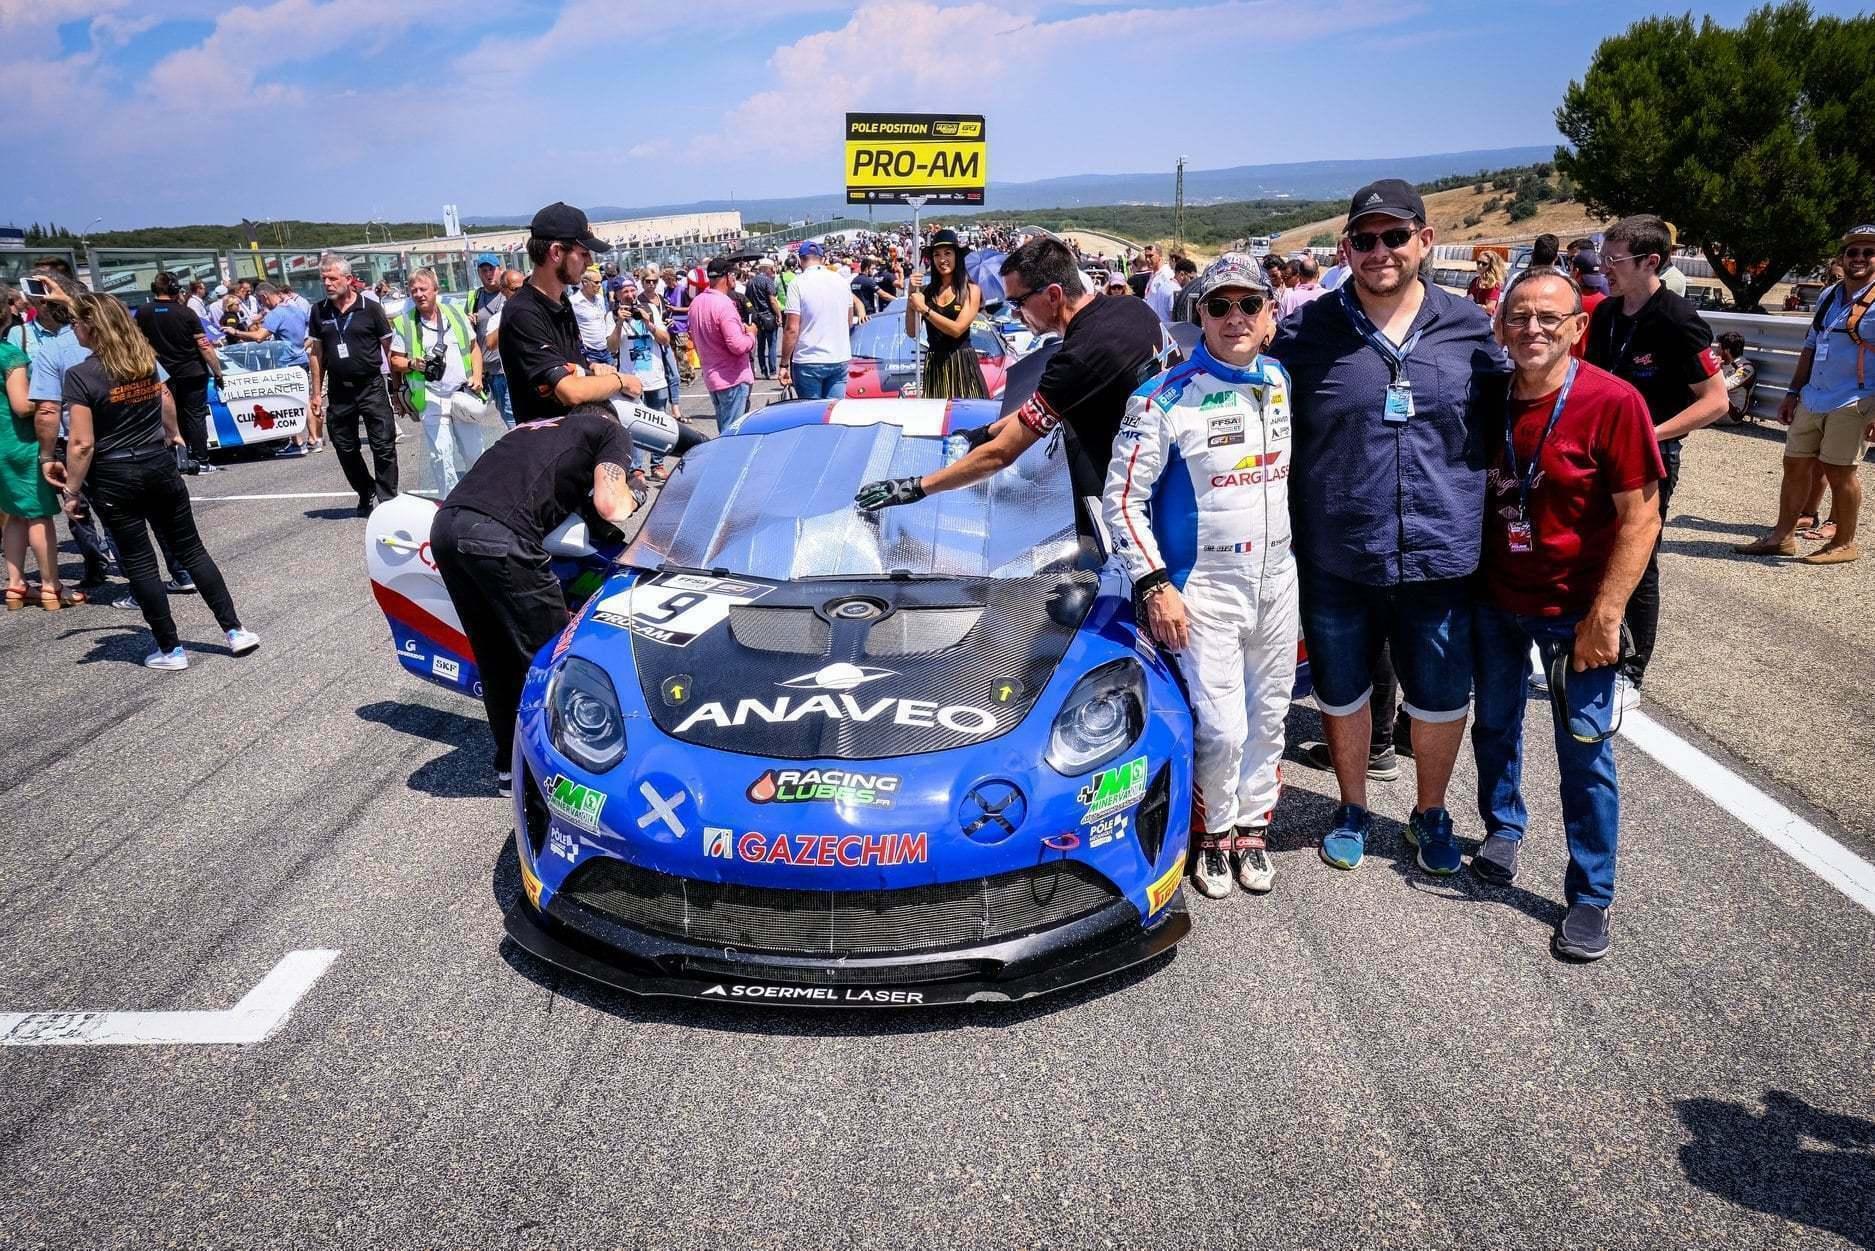 FFSA GT: CMR reprend la main Lédenon ! (Course 2) 8